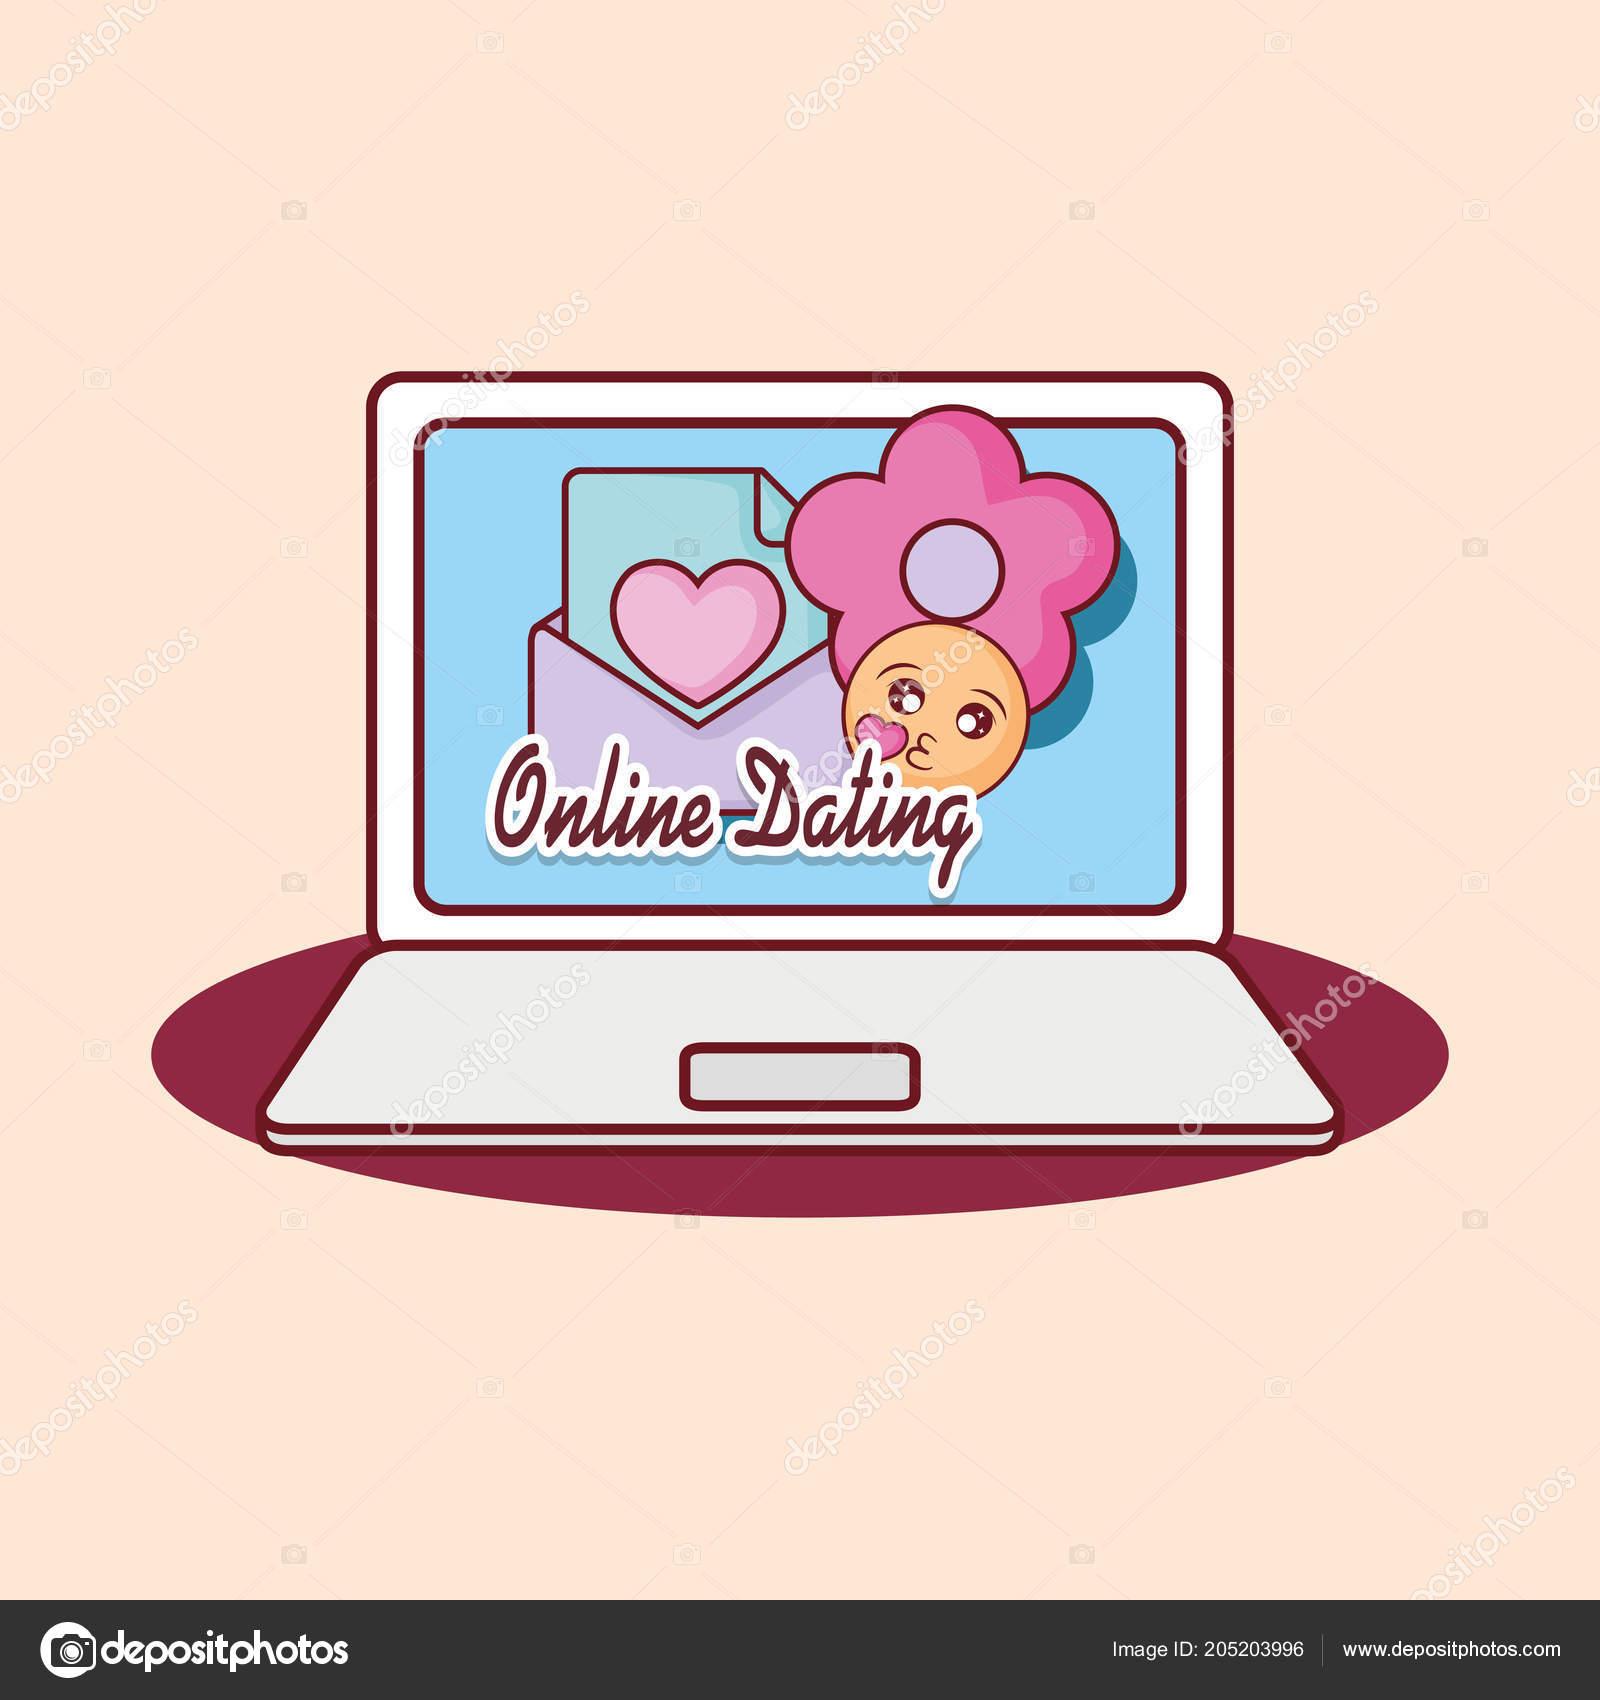 Da jpg a vettoriale online dating